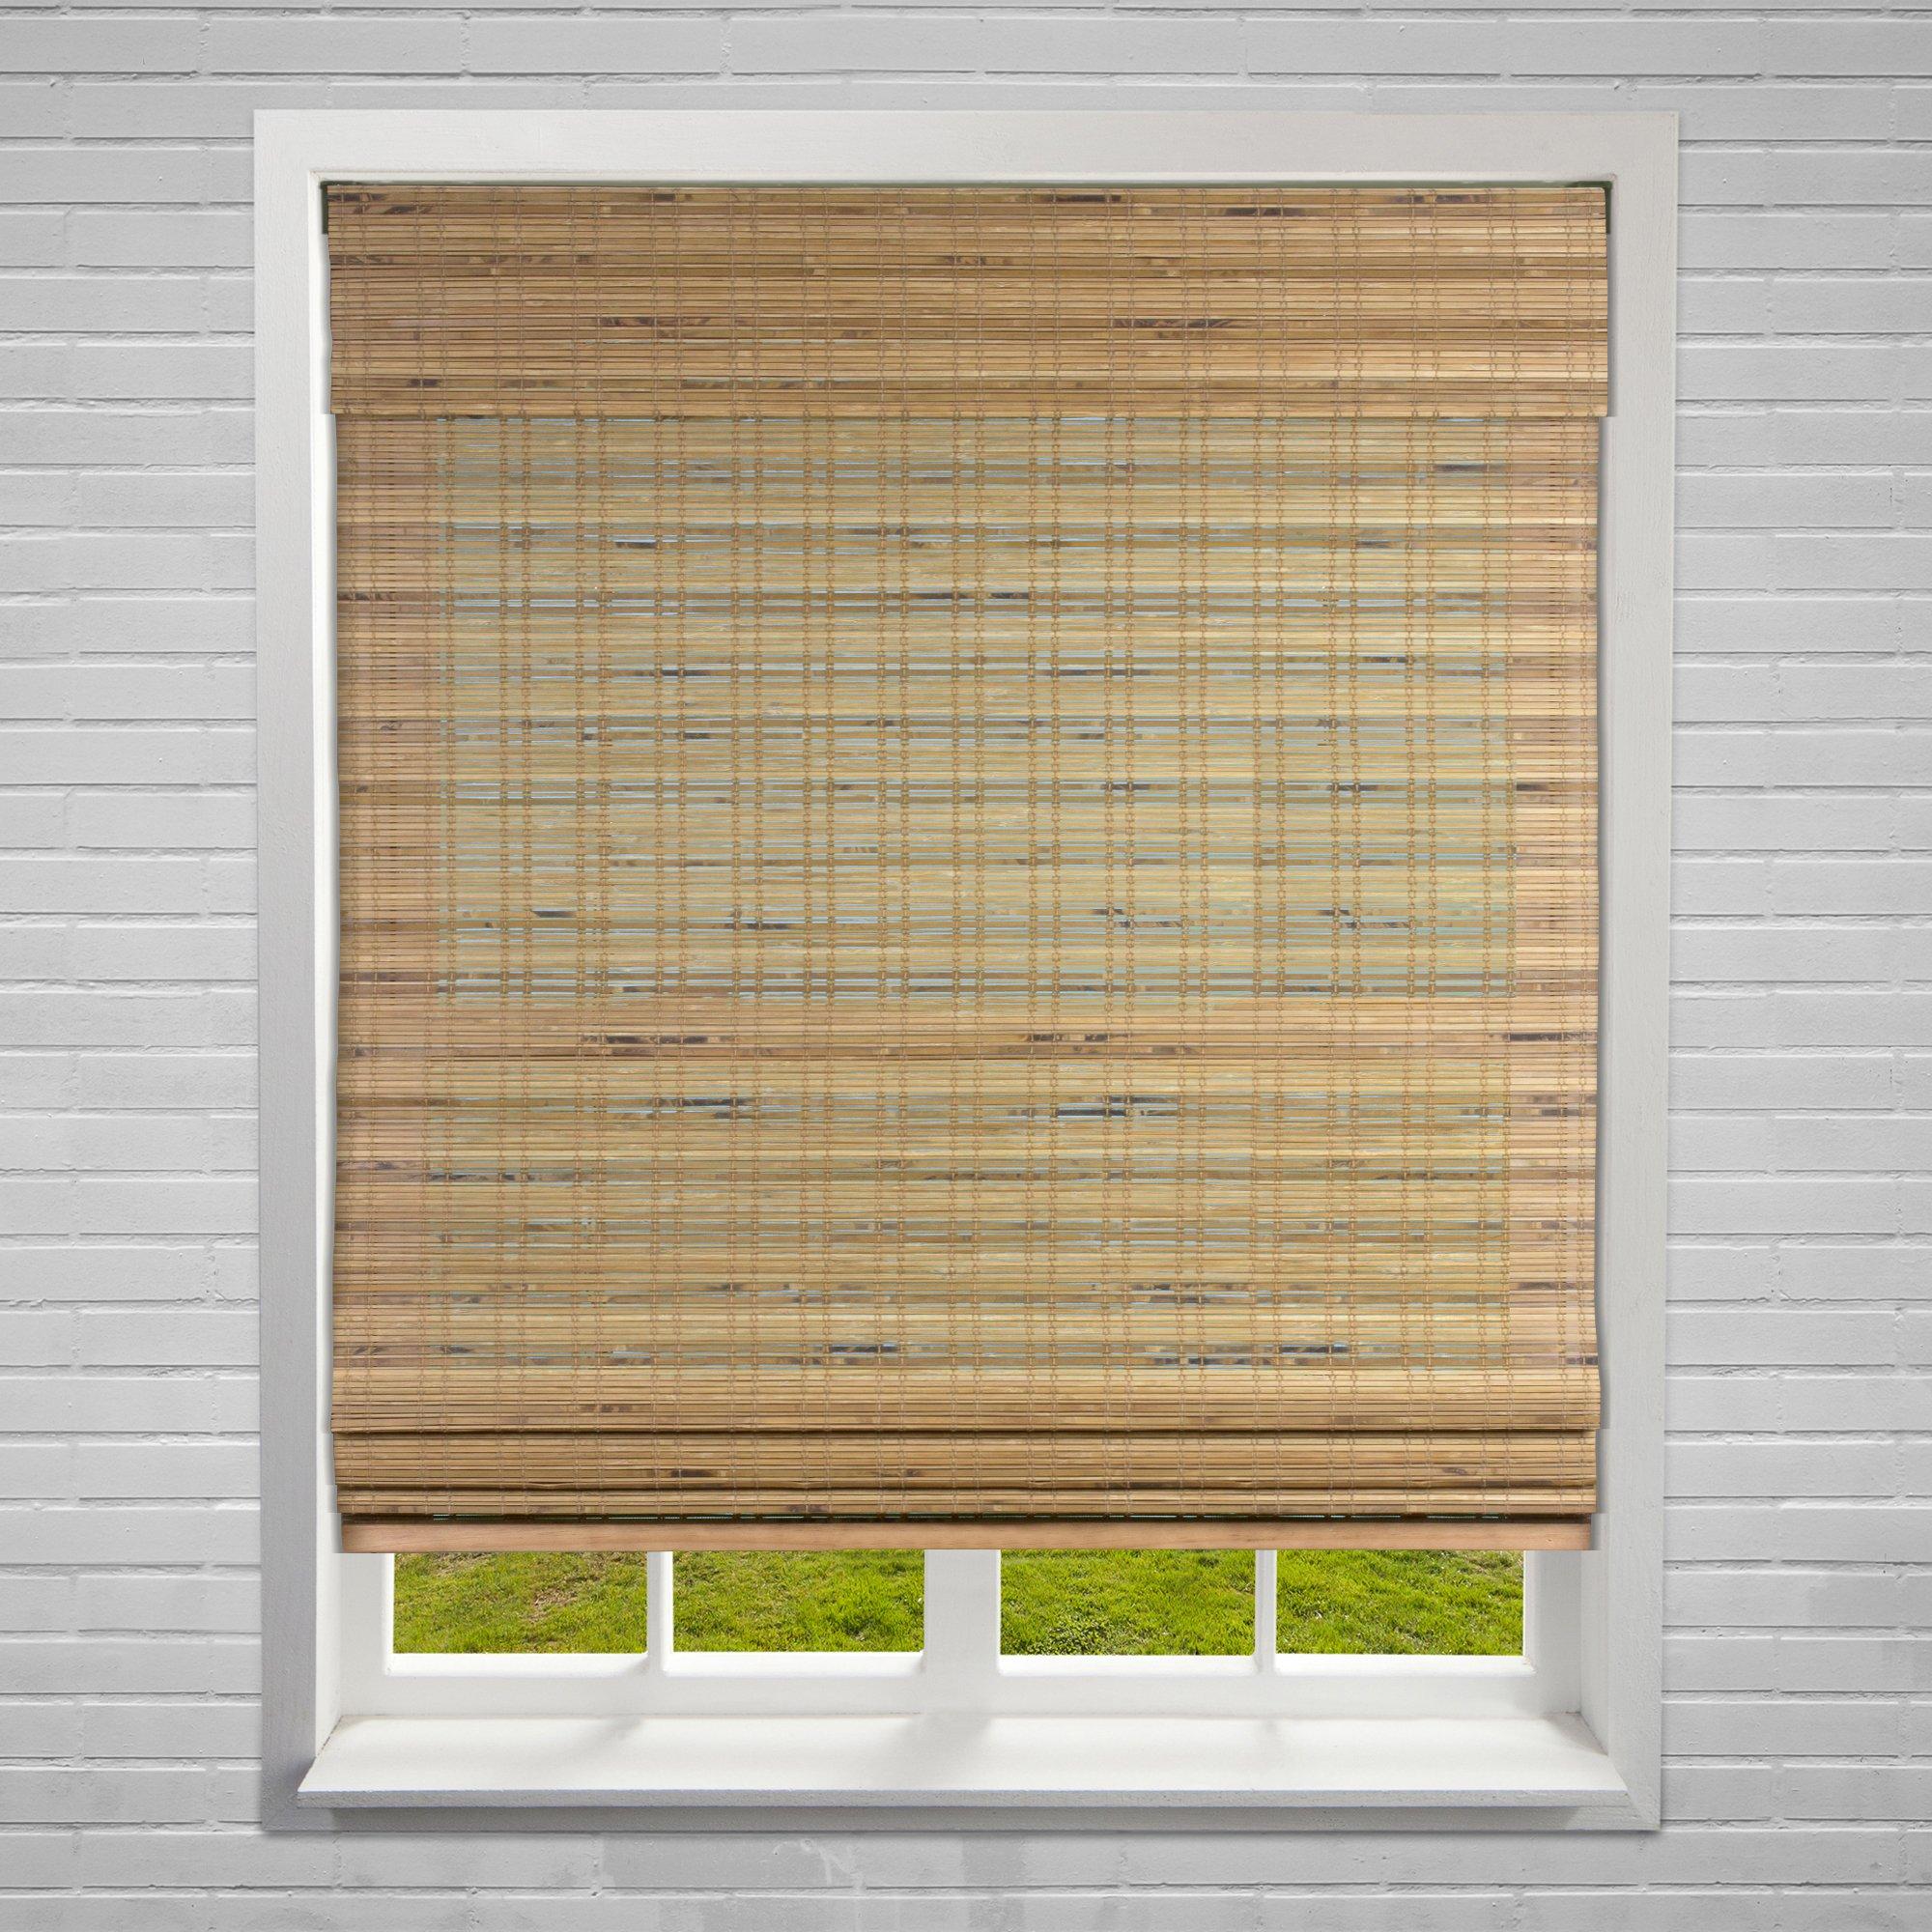 Calyx Interiors Bamboo Roman Window Blinds Shades, 28'' W x 60'' H, Cordless Dali Tuscan by Calyx Interiors